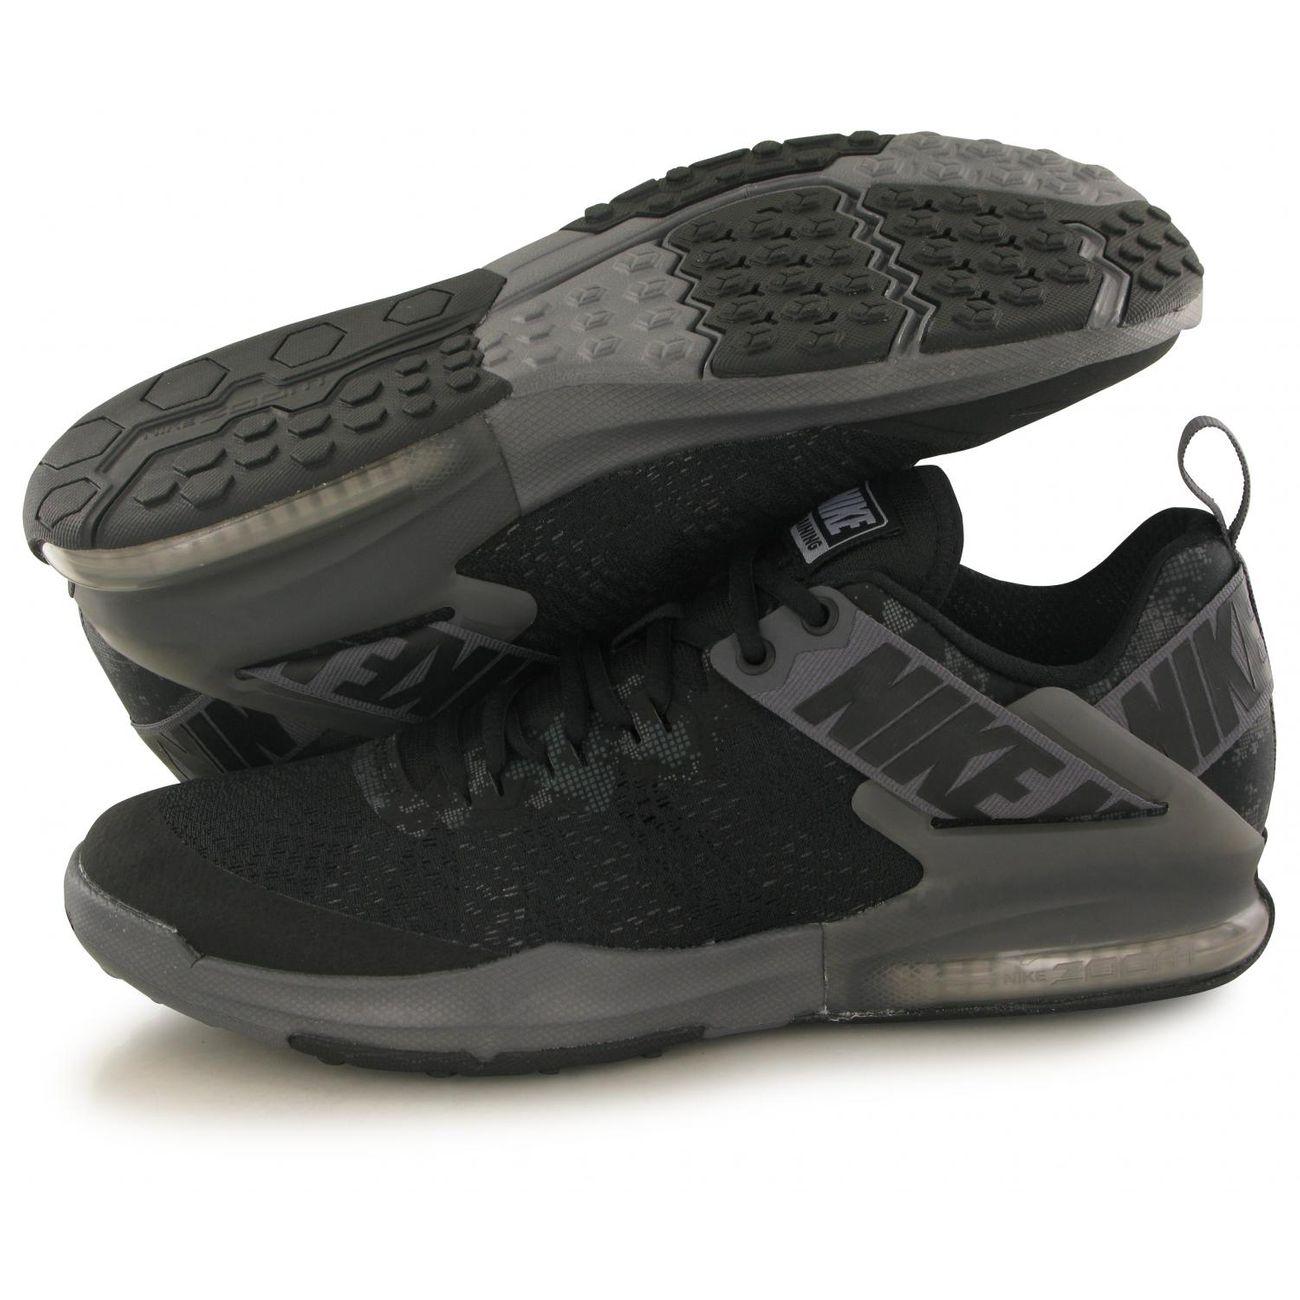 Homme Domination Baskets 2 Zoom ModeLifestyle Nike Tr TFJlK1c